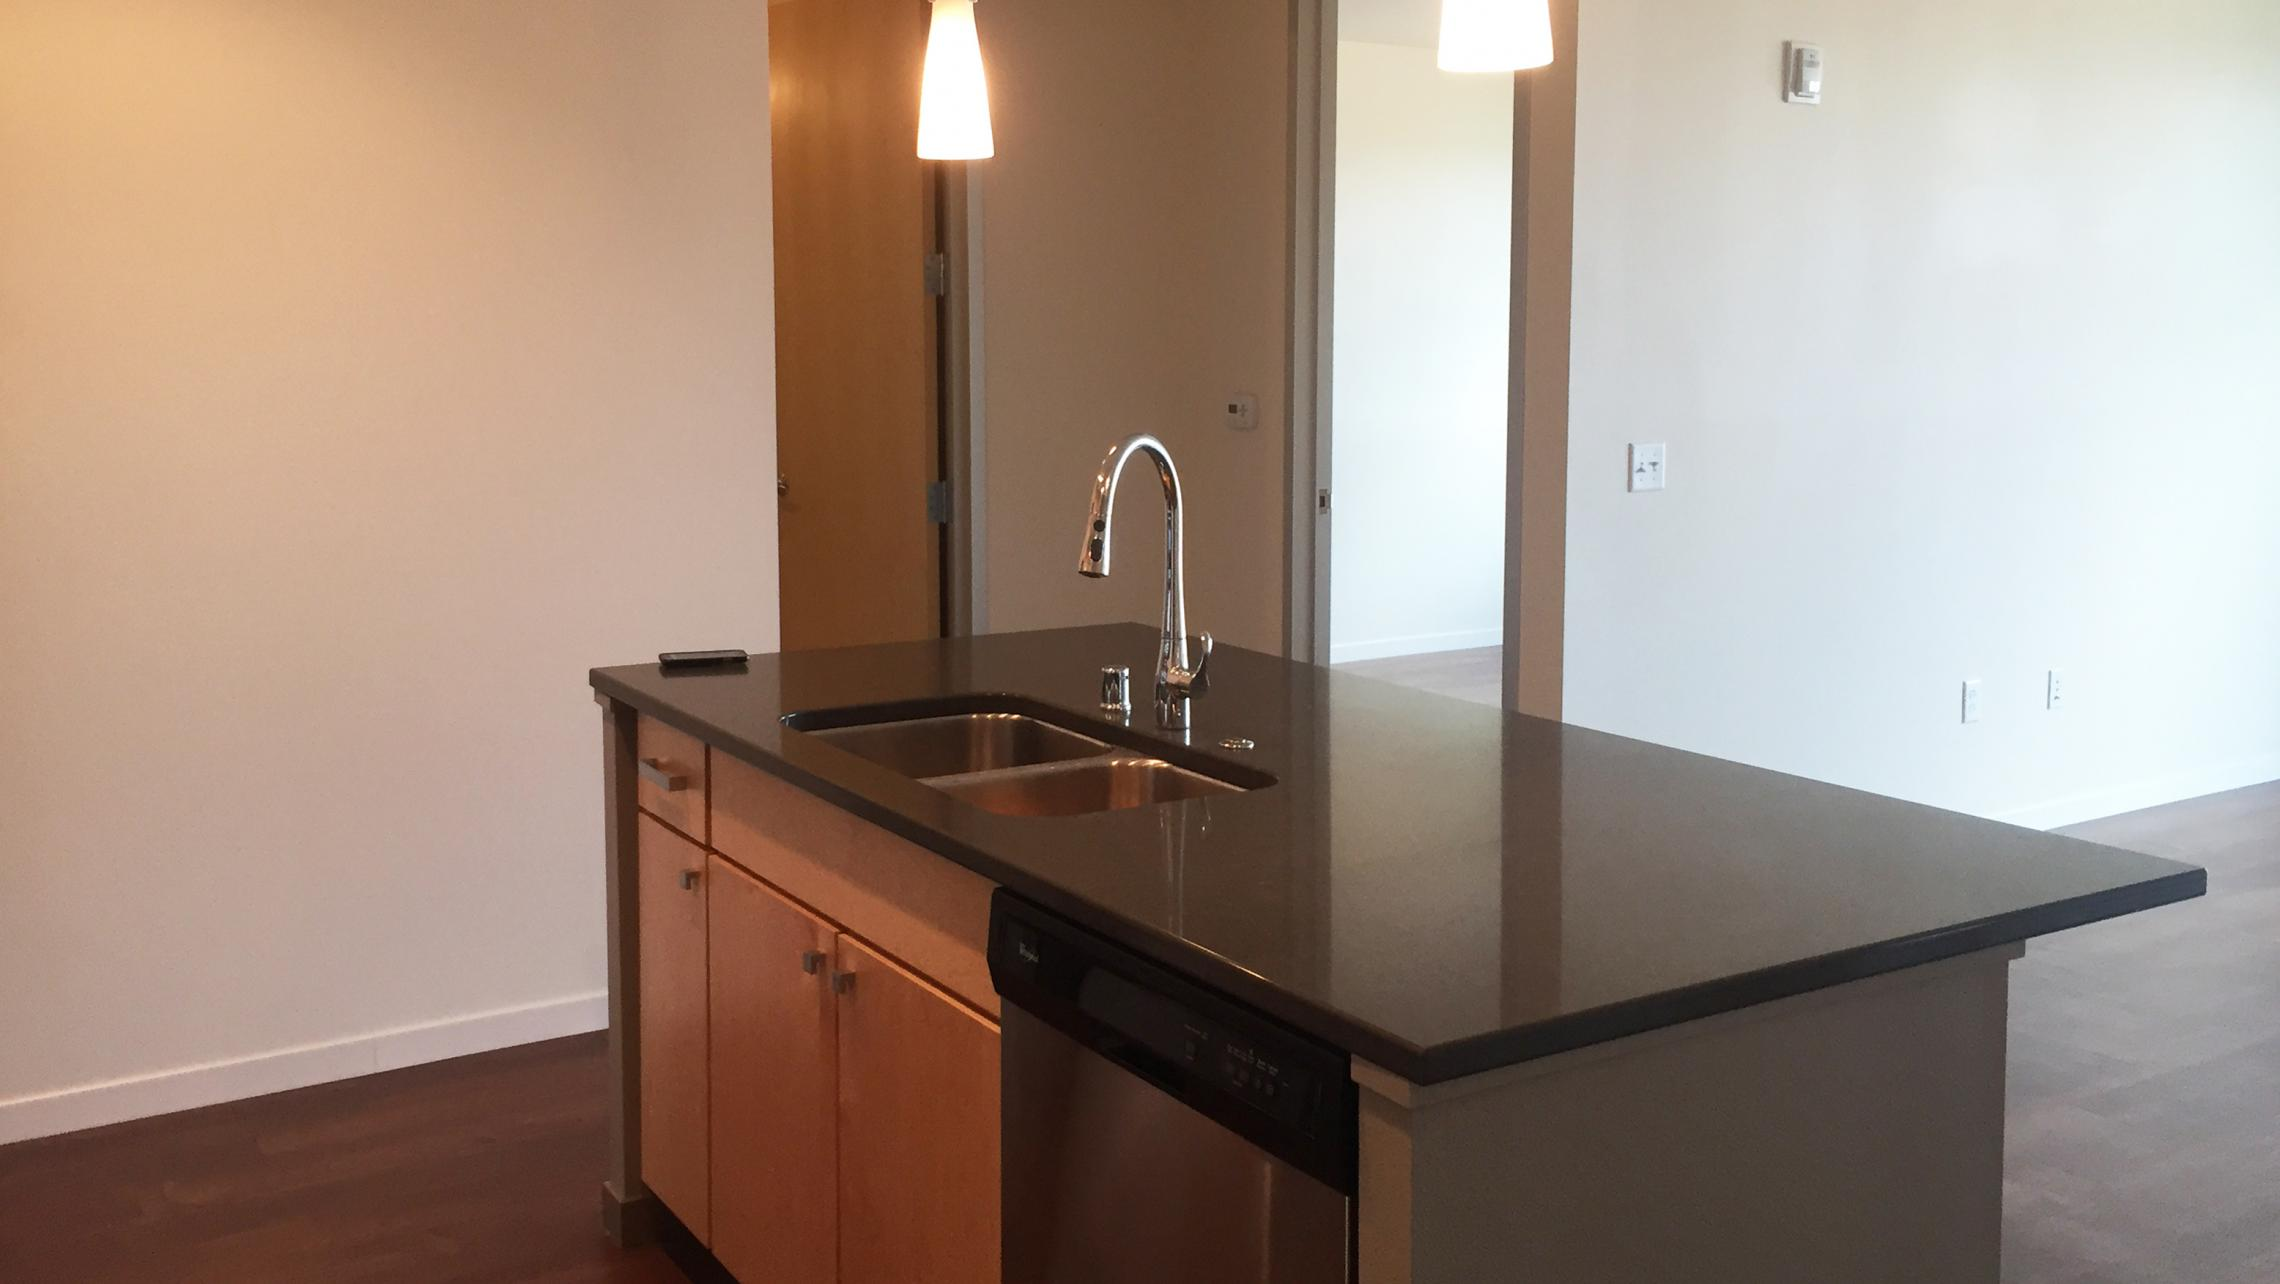 ULI Nine Line Apartment 319 - Kitchen Island